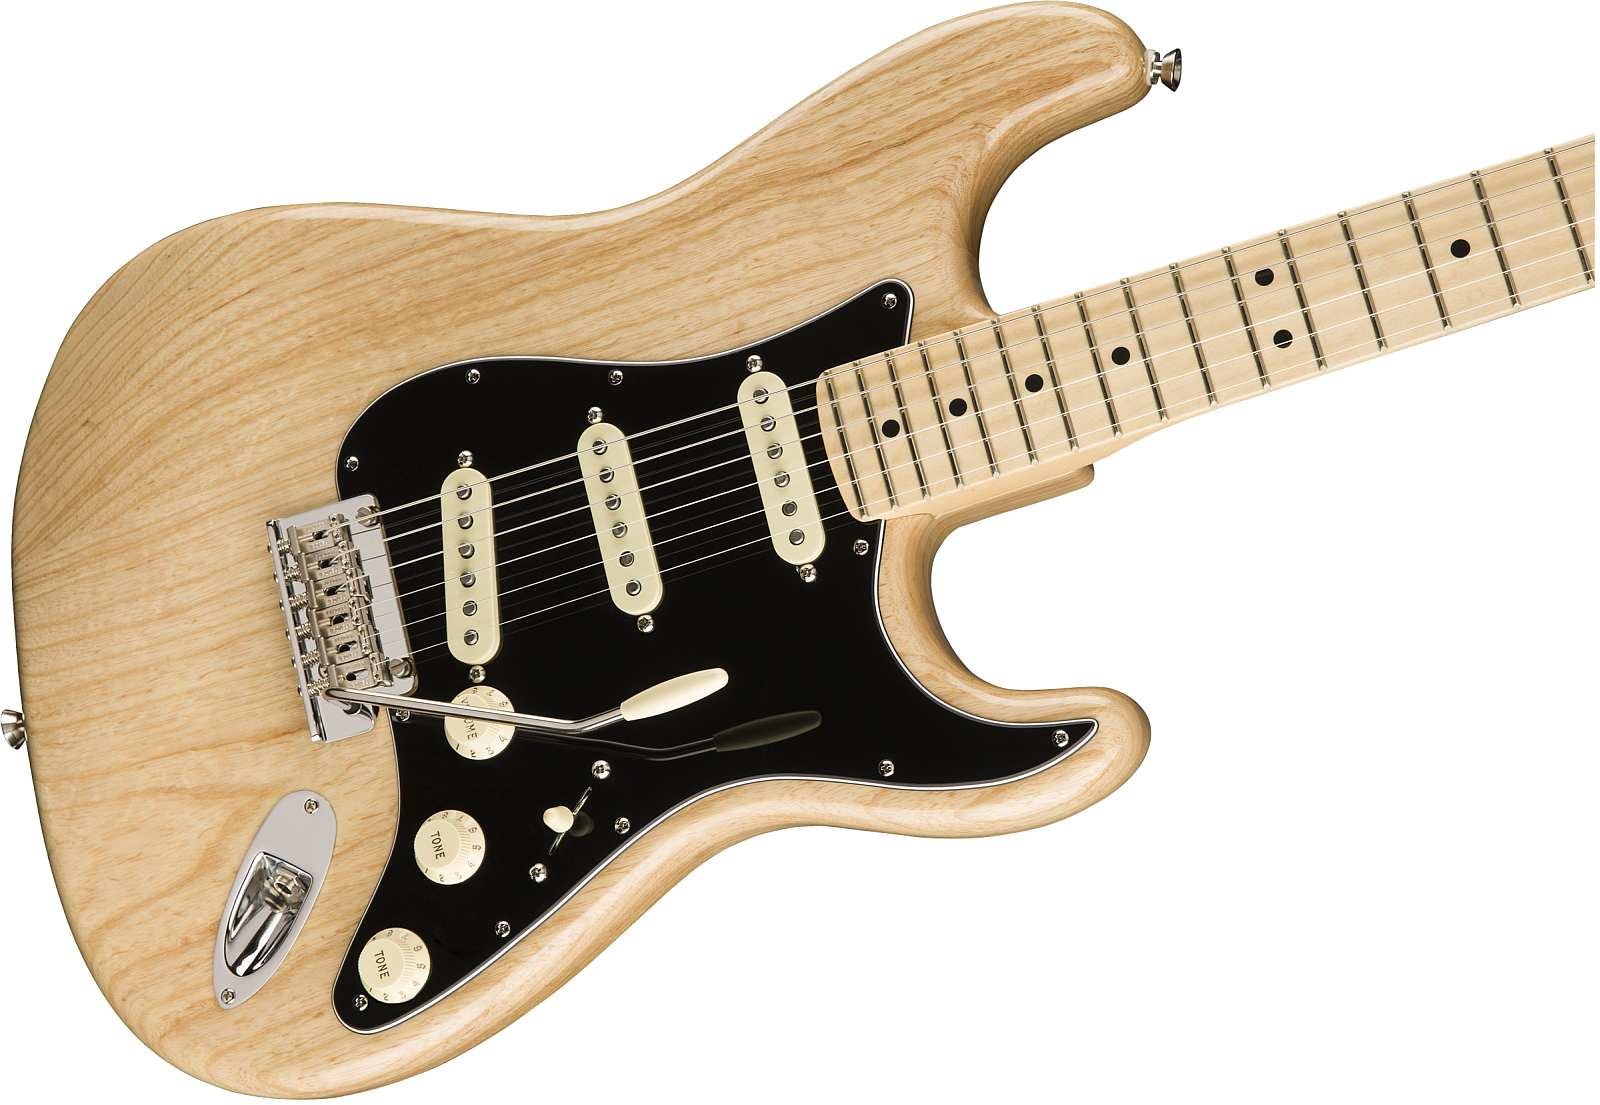 Fantastisch Fender Stratocaster Doppelhals Gitarrenkabel Fotos - Der ...